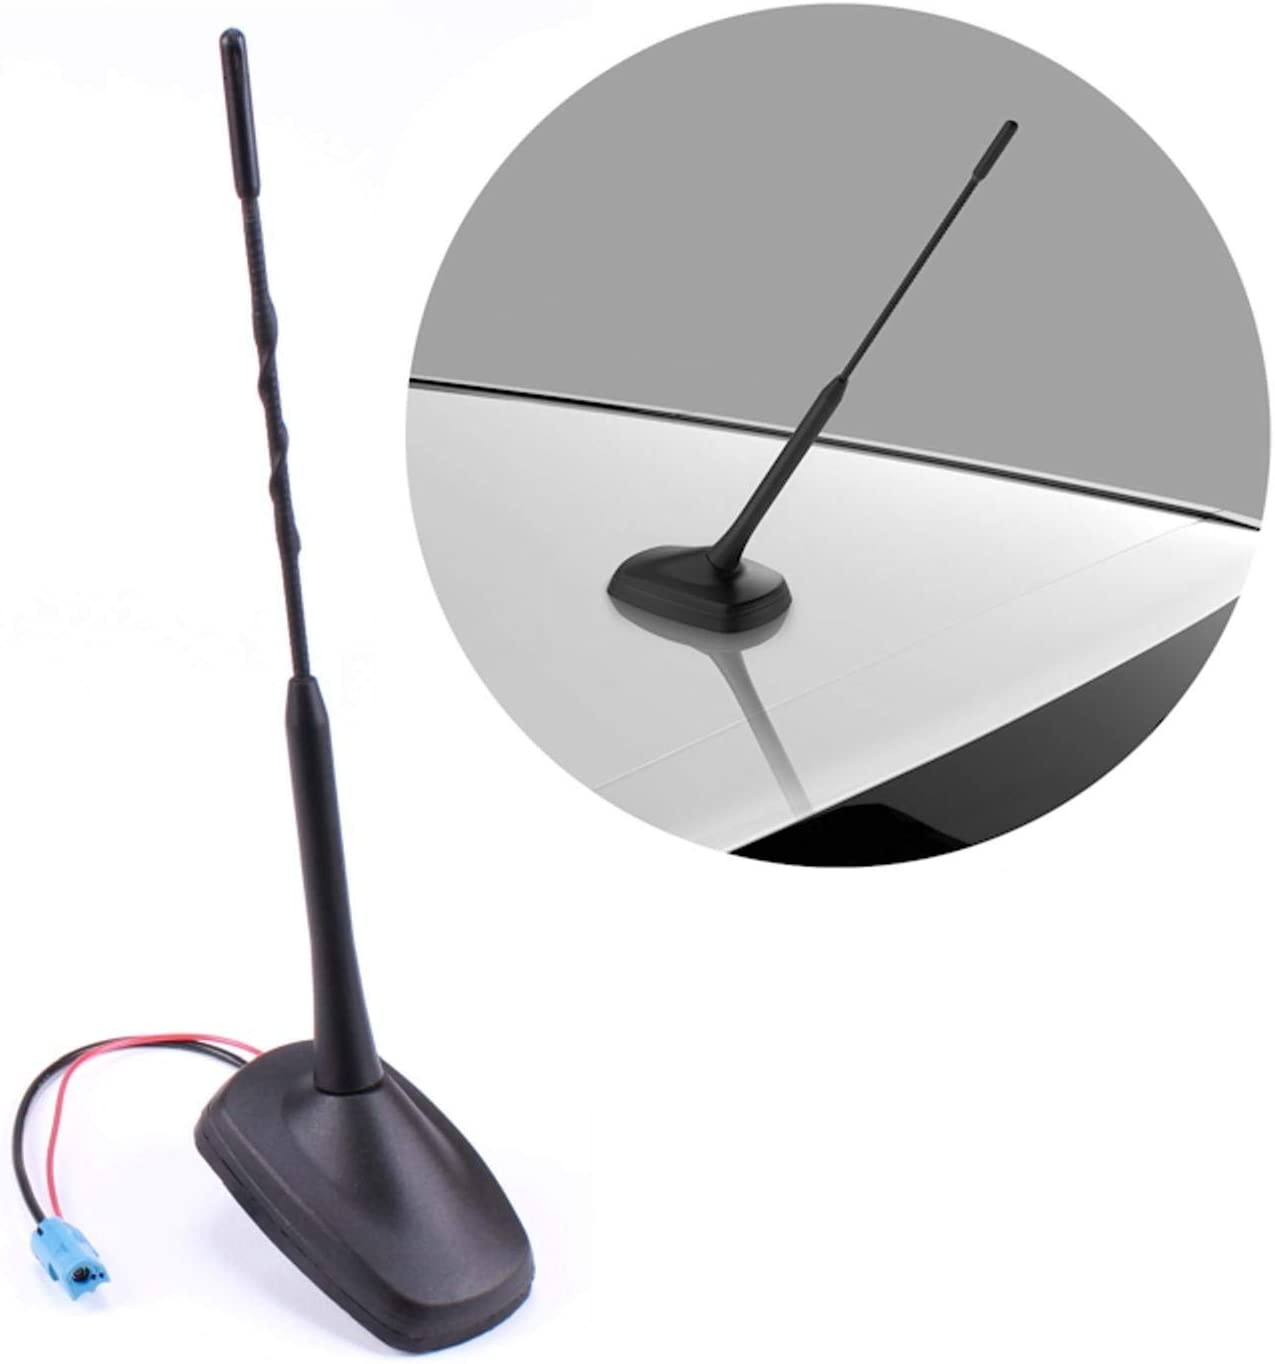 Dachantenne Antenne Stabantenne Antennenfuss Sockel Adapter Radio Auto